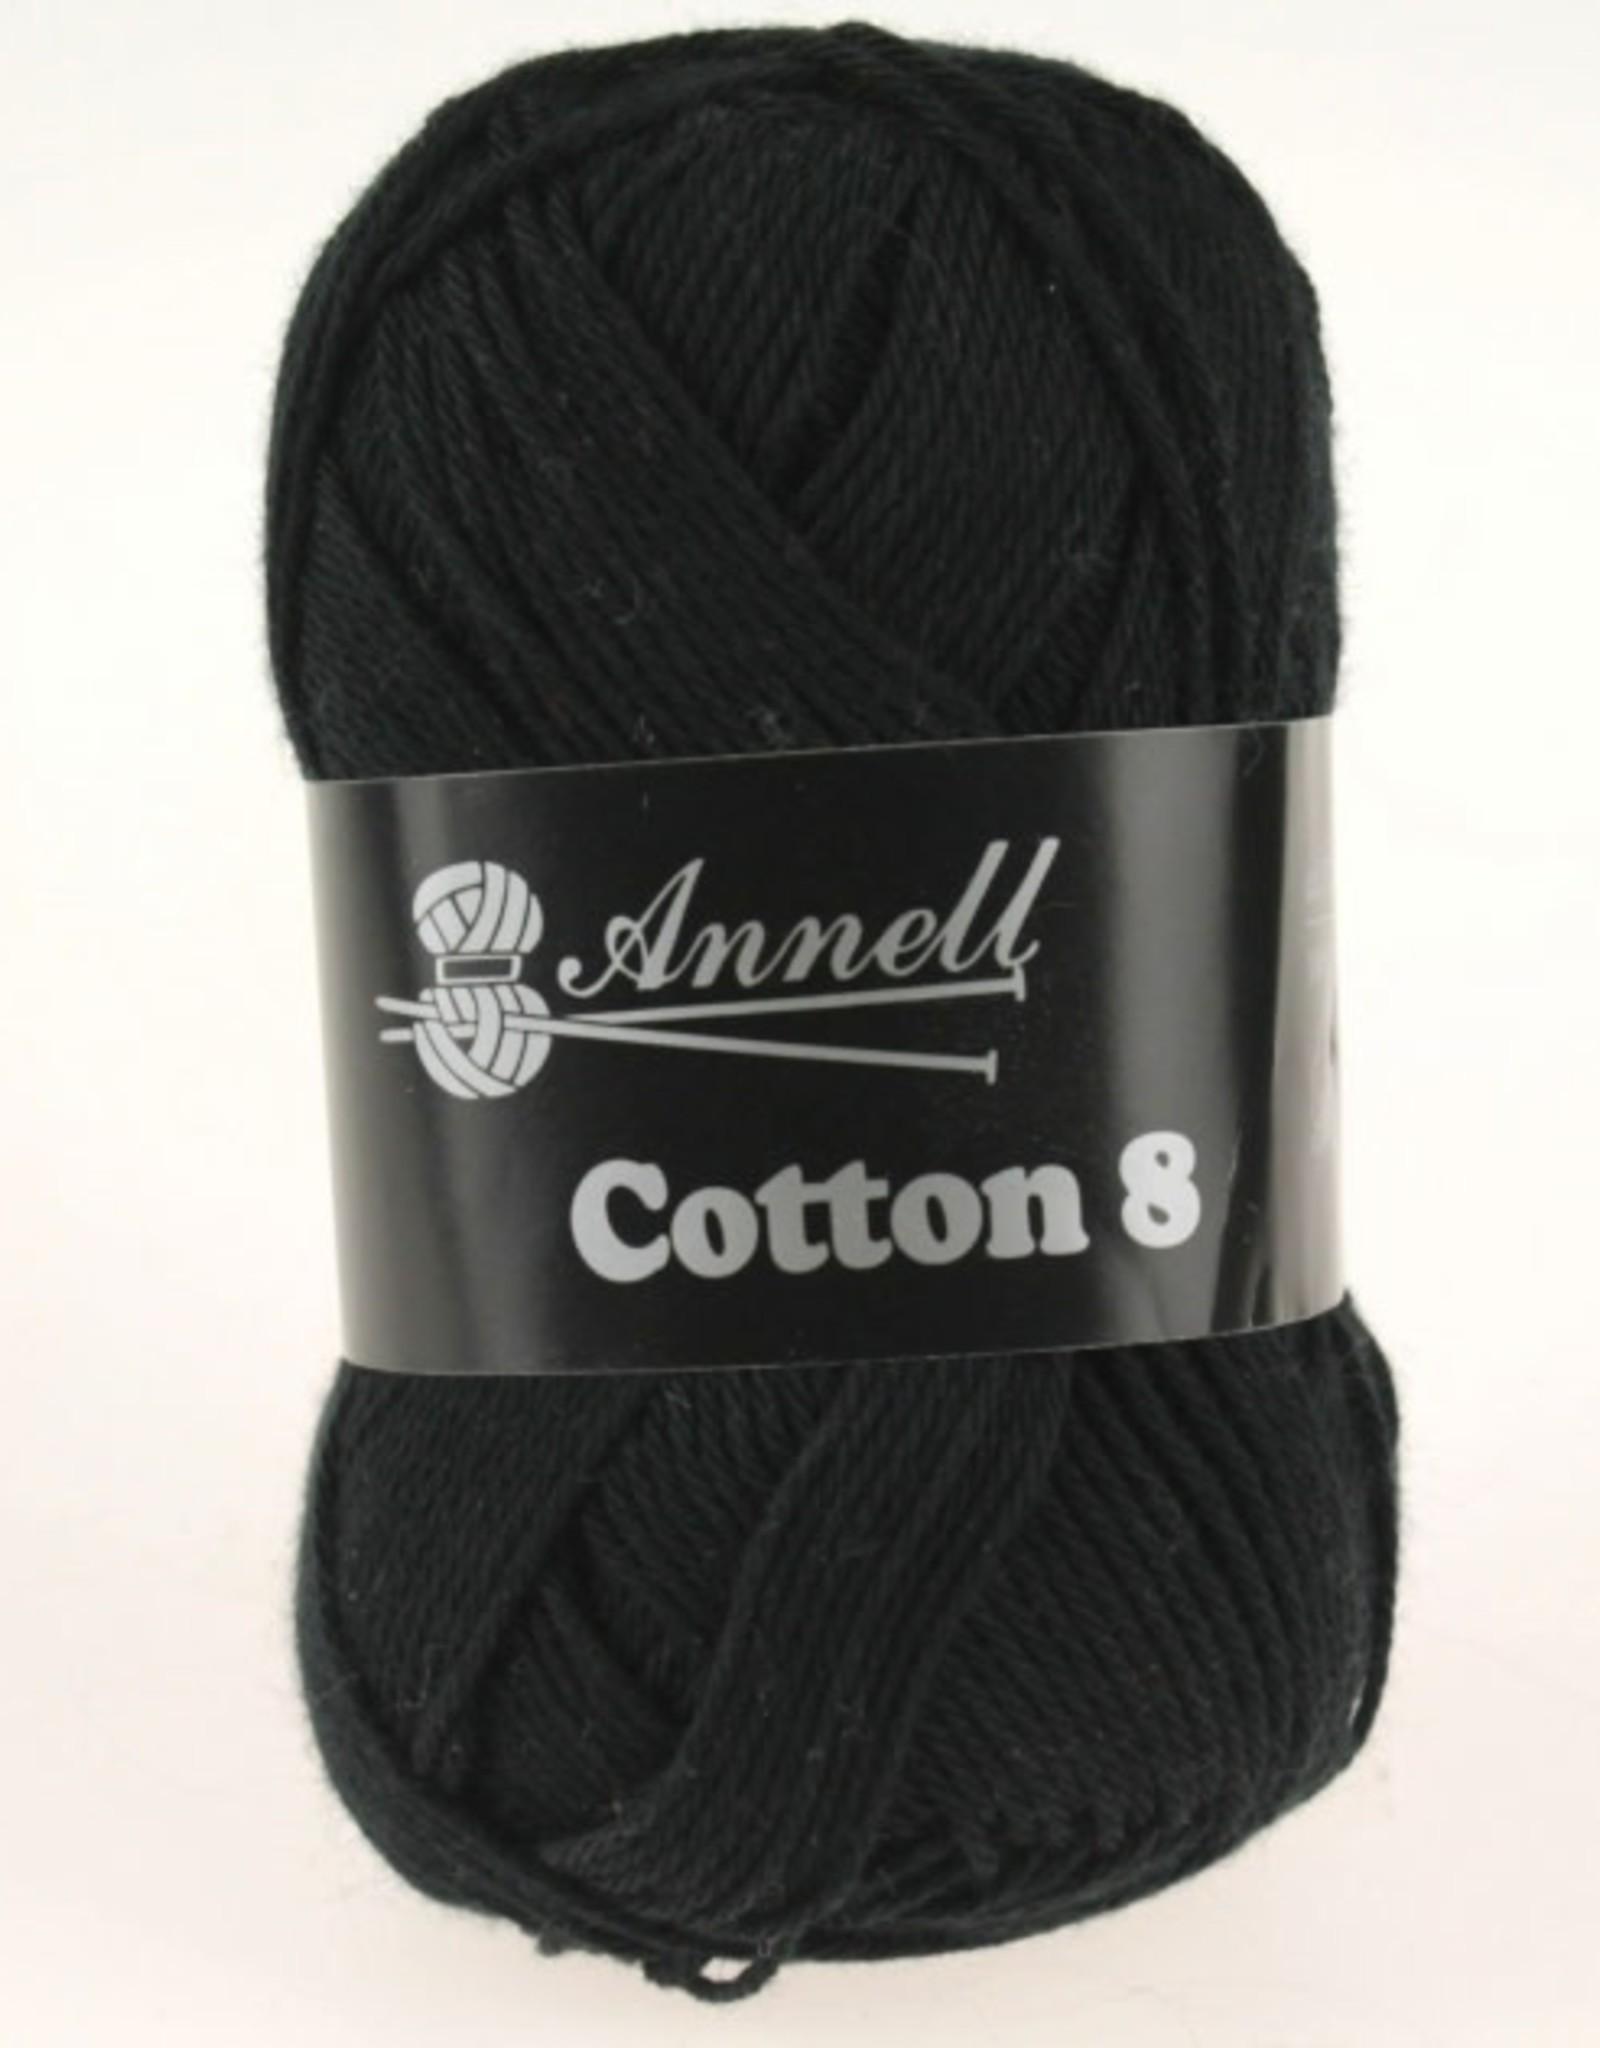 Annell Annell Cotton 8 59